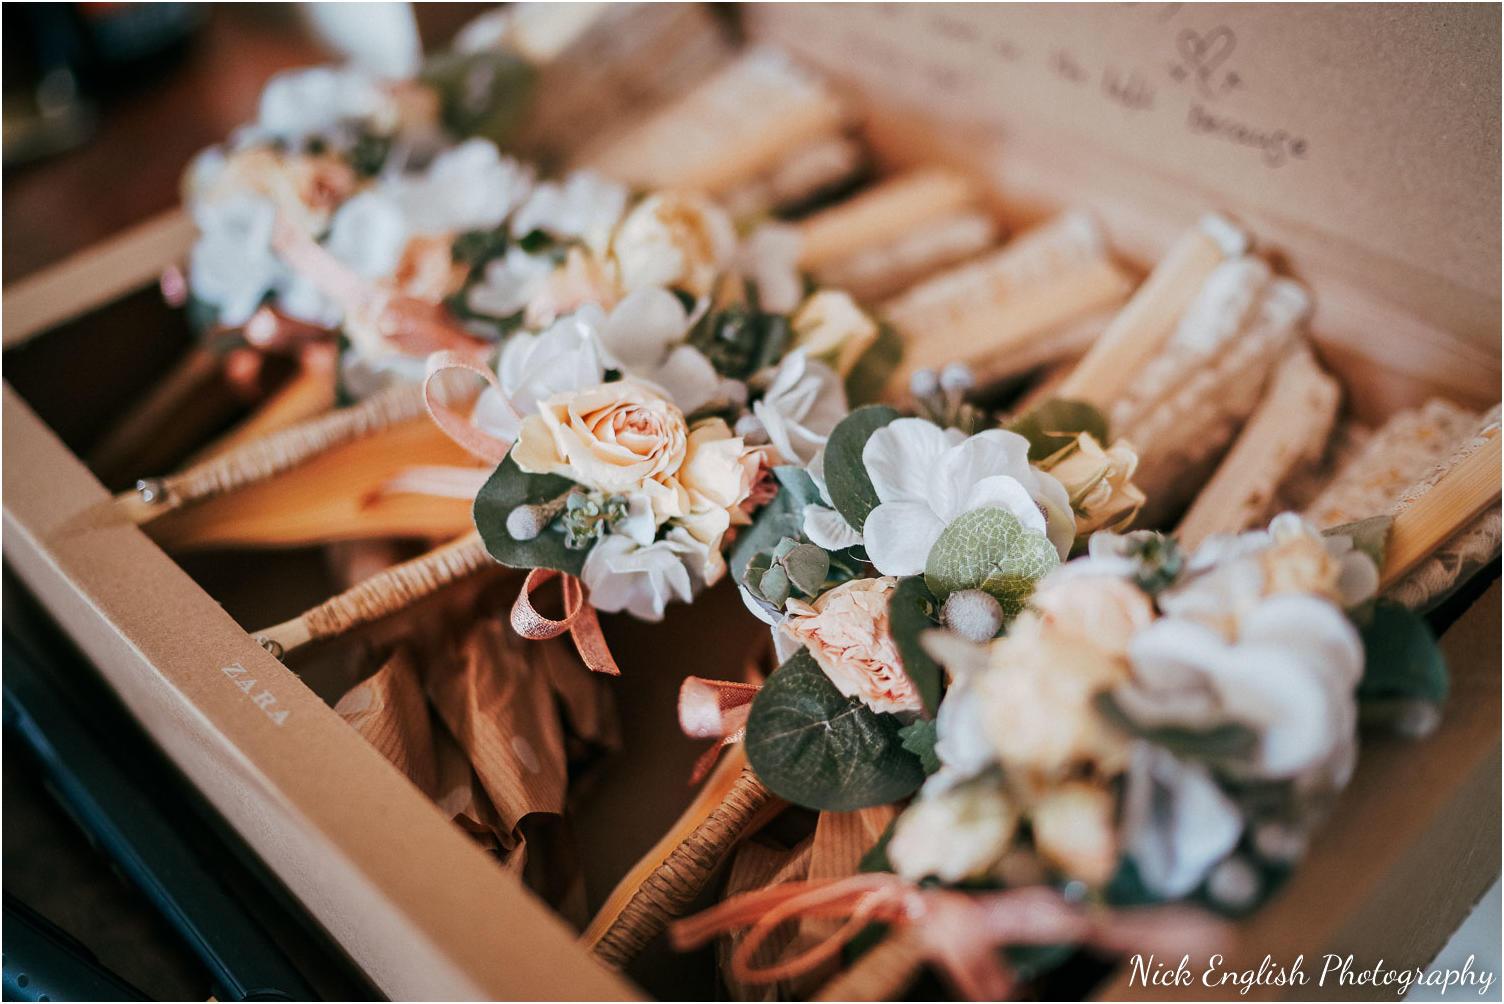 Destination_Wedding_Photographer_Slovenia_Nick_English_Photography-13.jpg